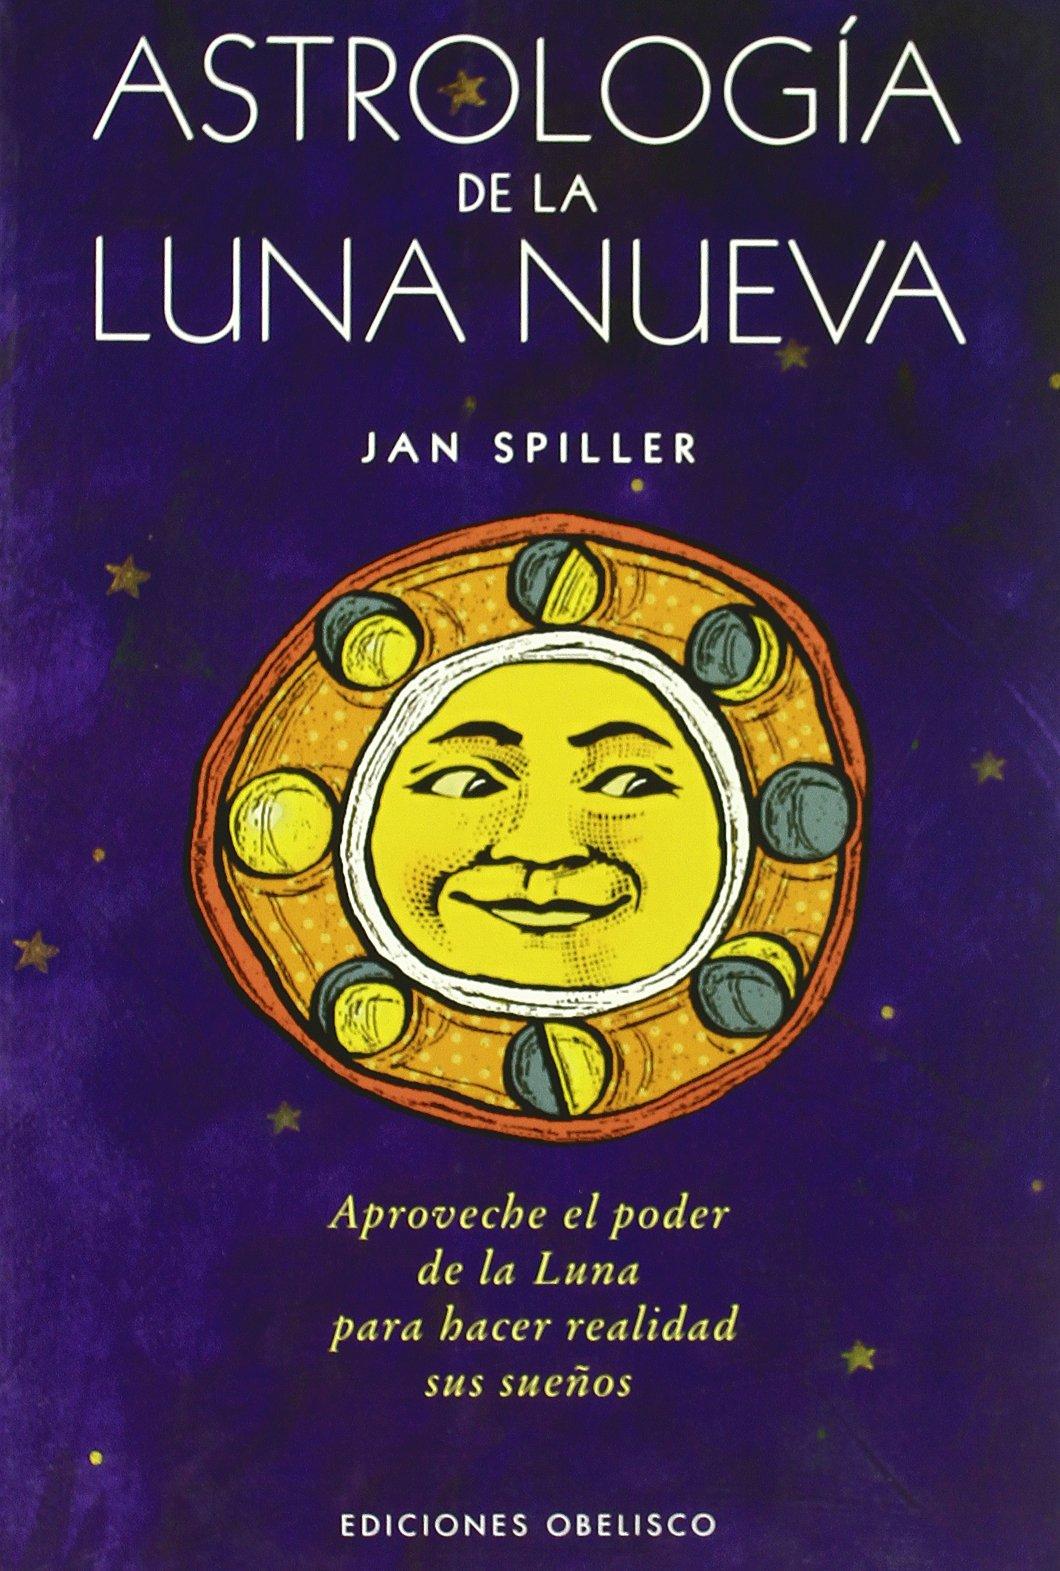 Astrologia de la luna nueva (Spanish Edition) pdf